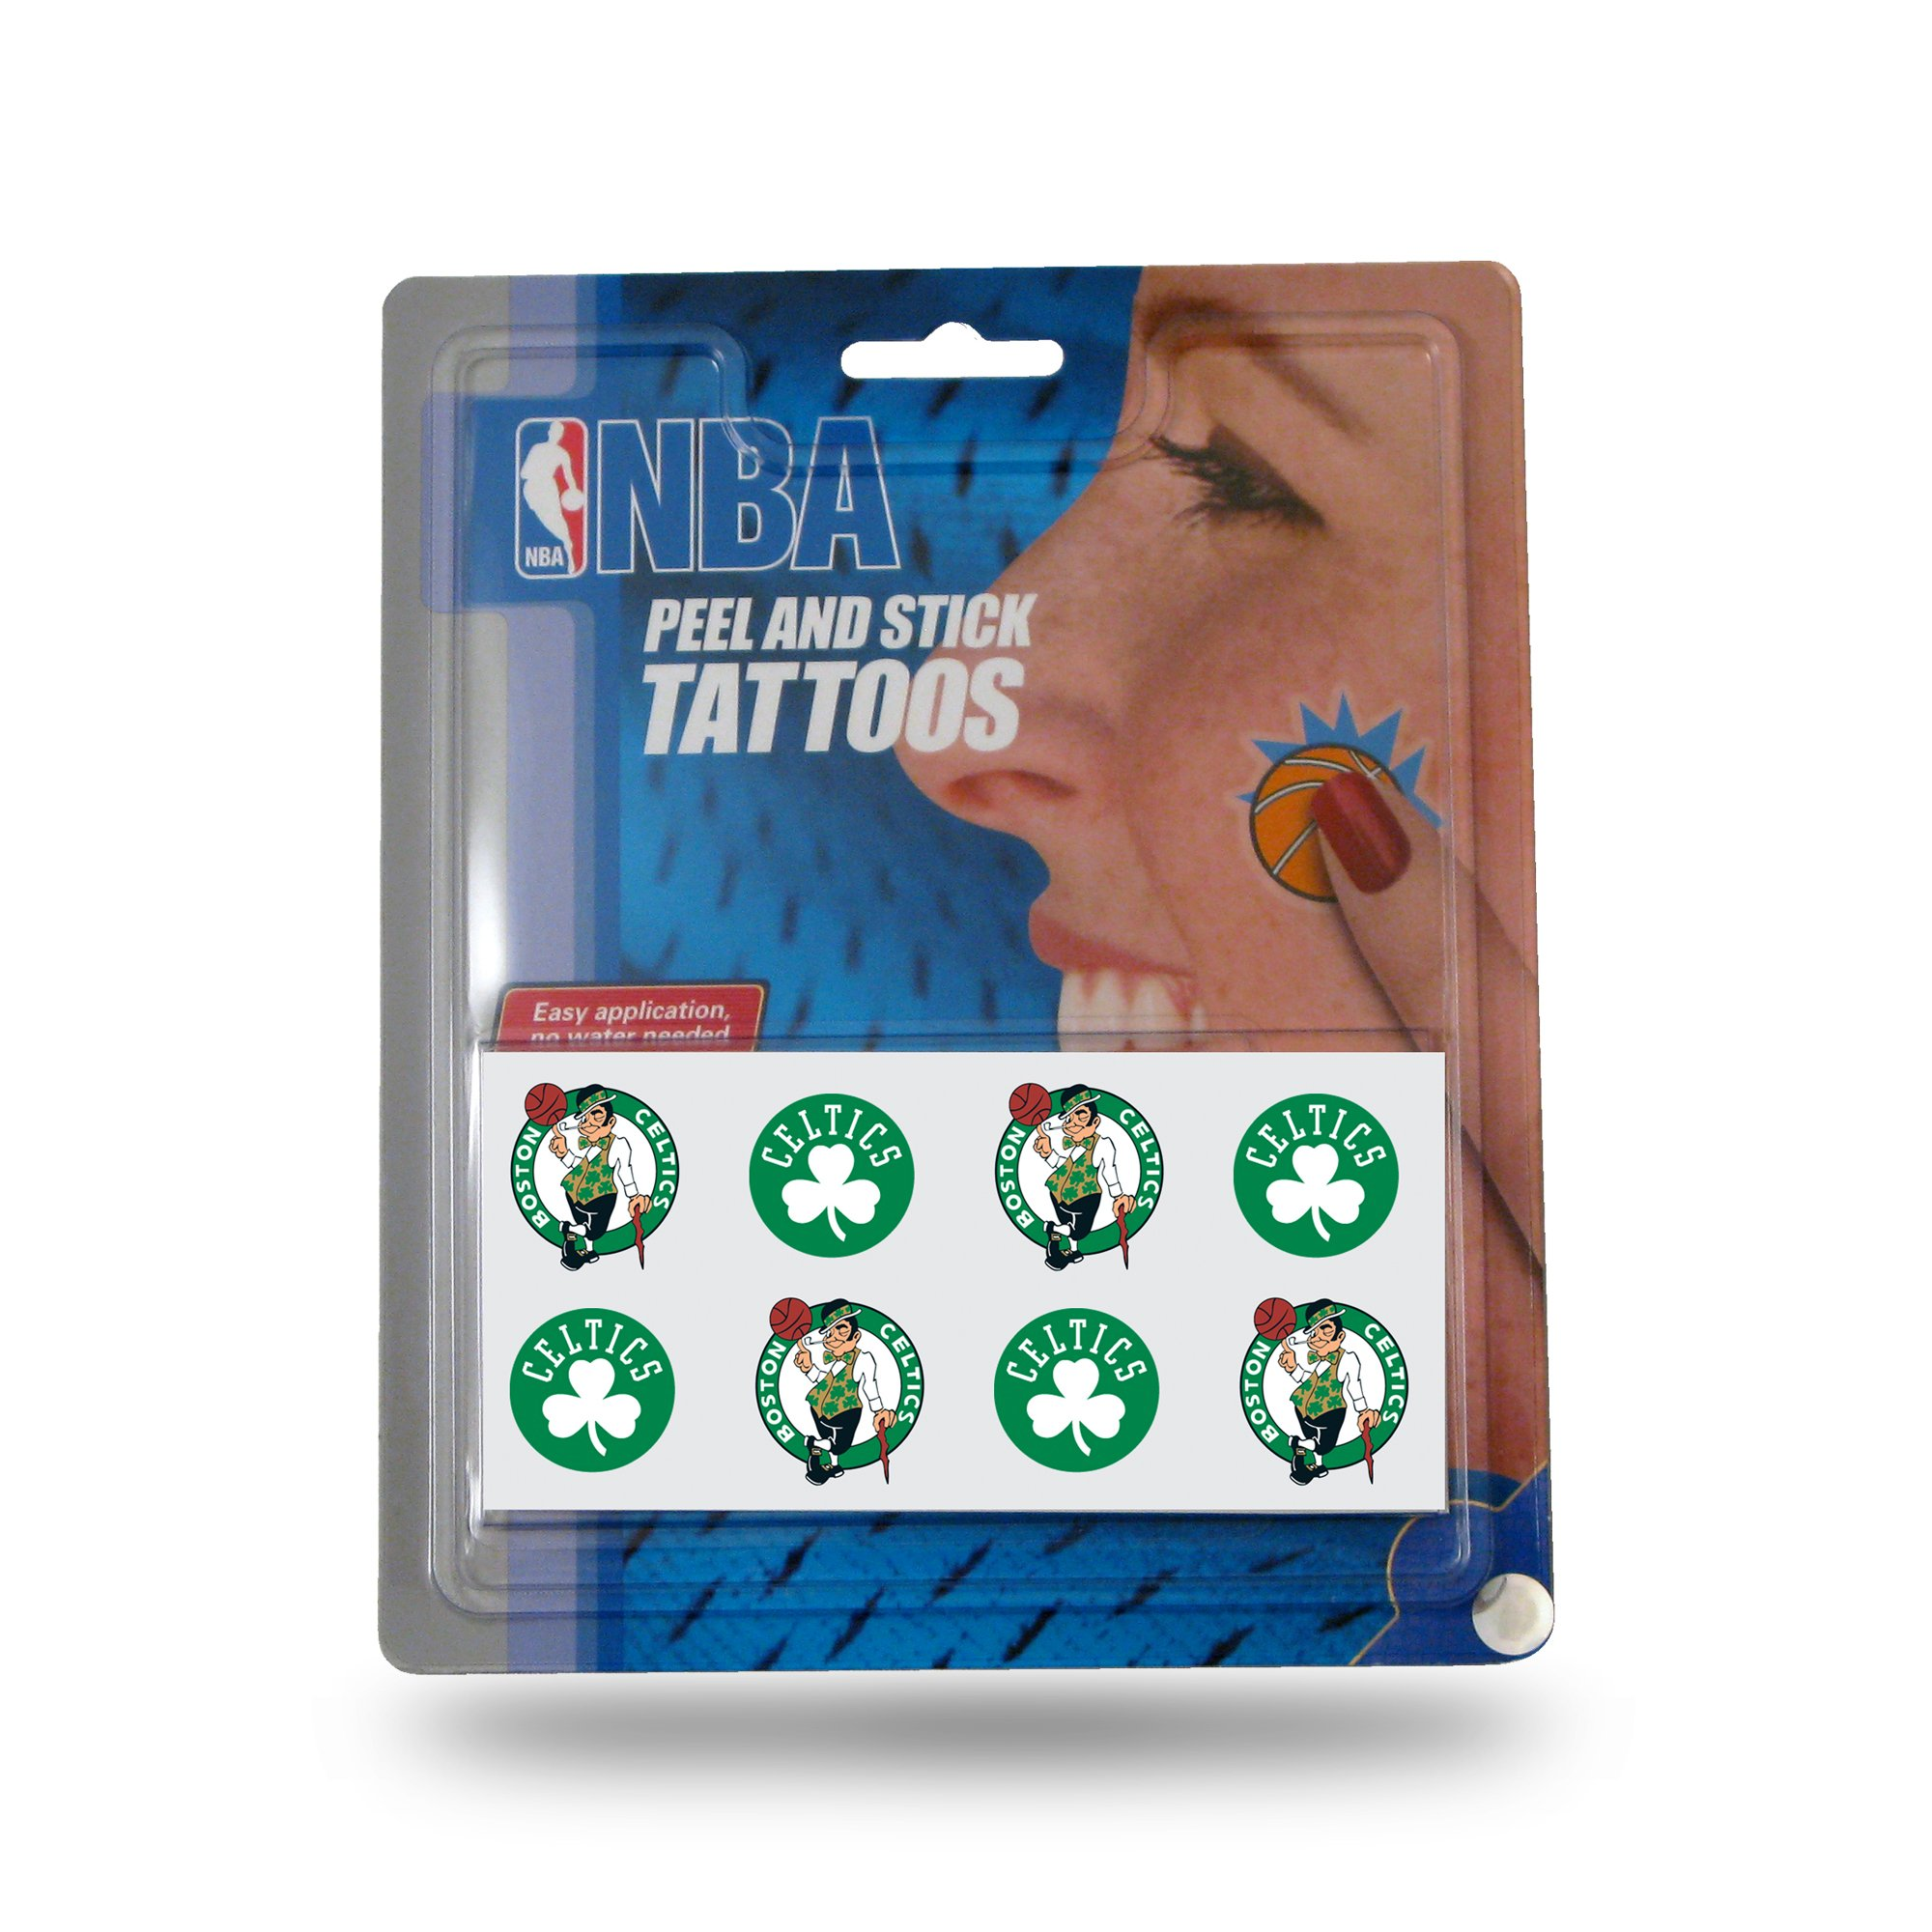 NBA Boston Celtics Face Tattoos, 8-Piece Set